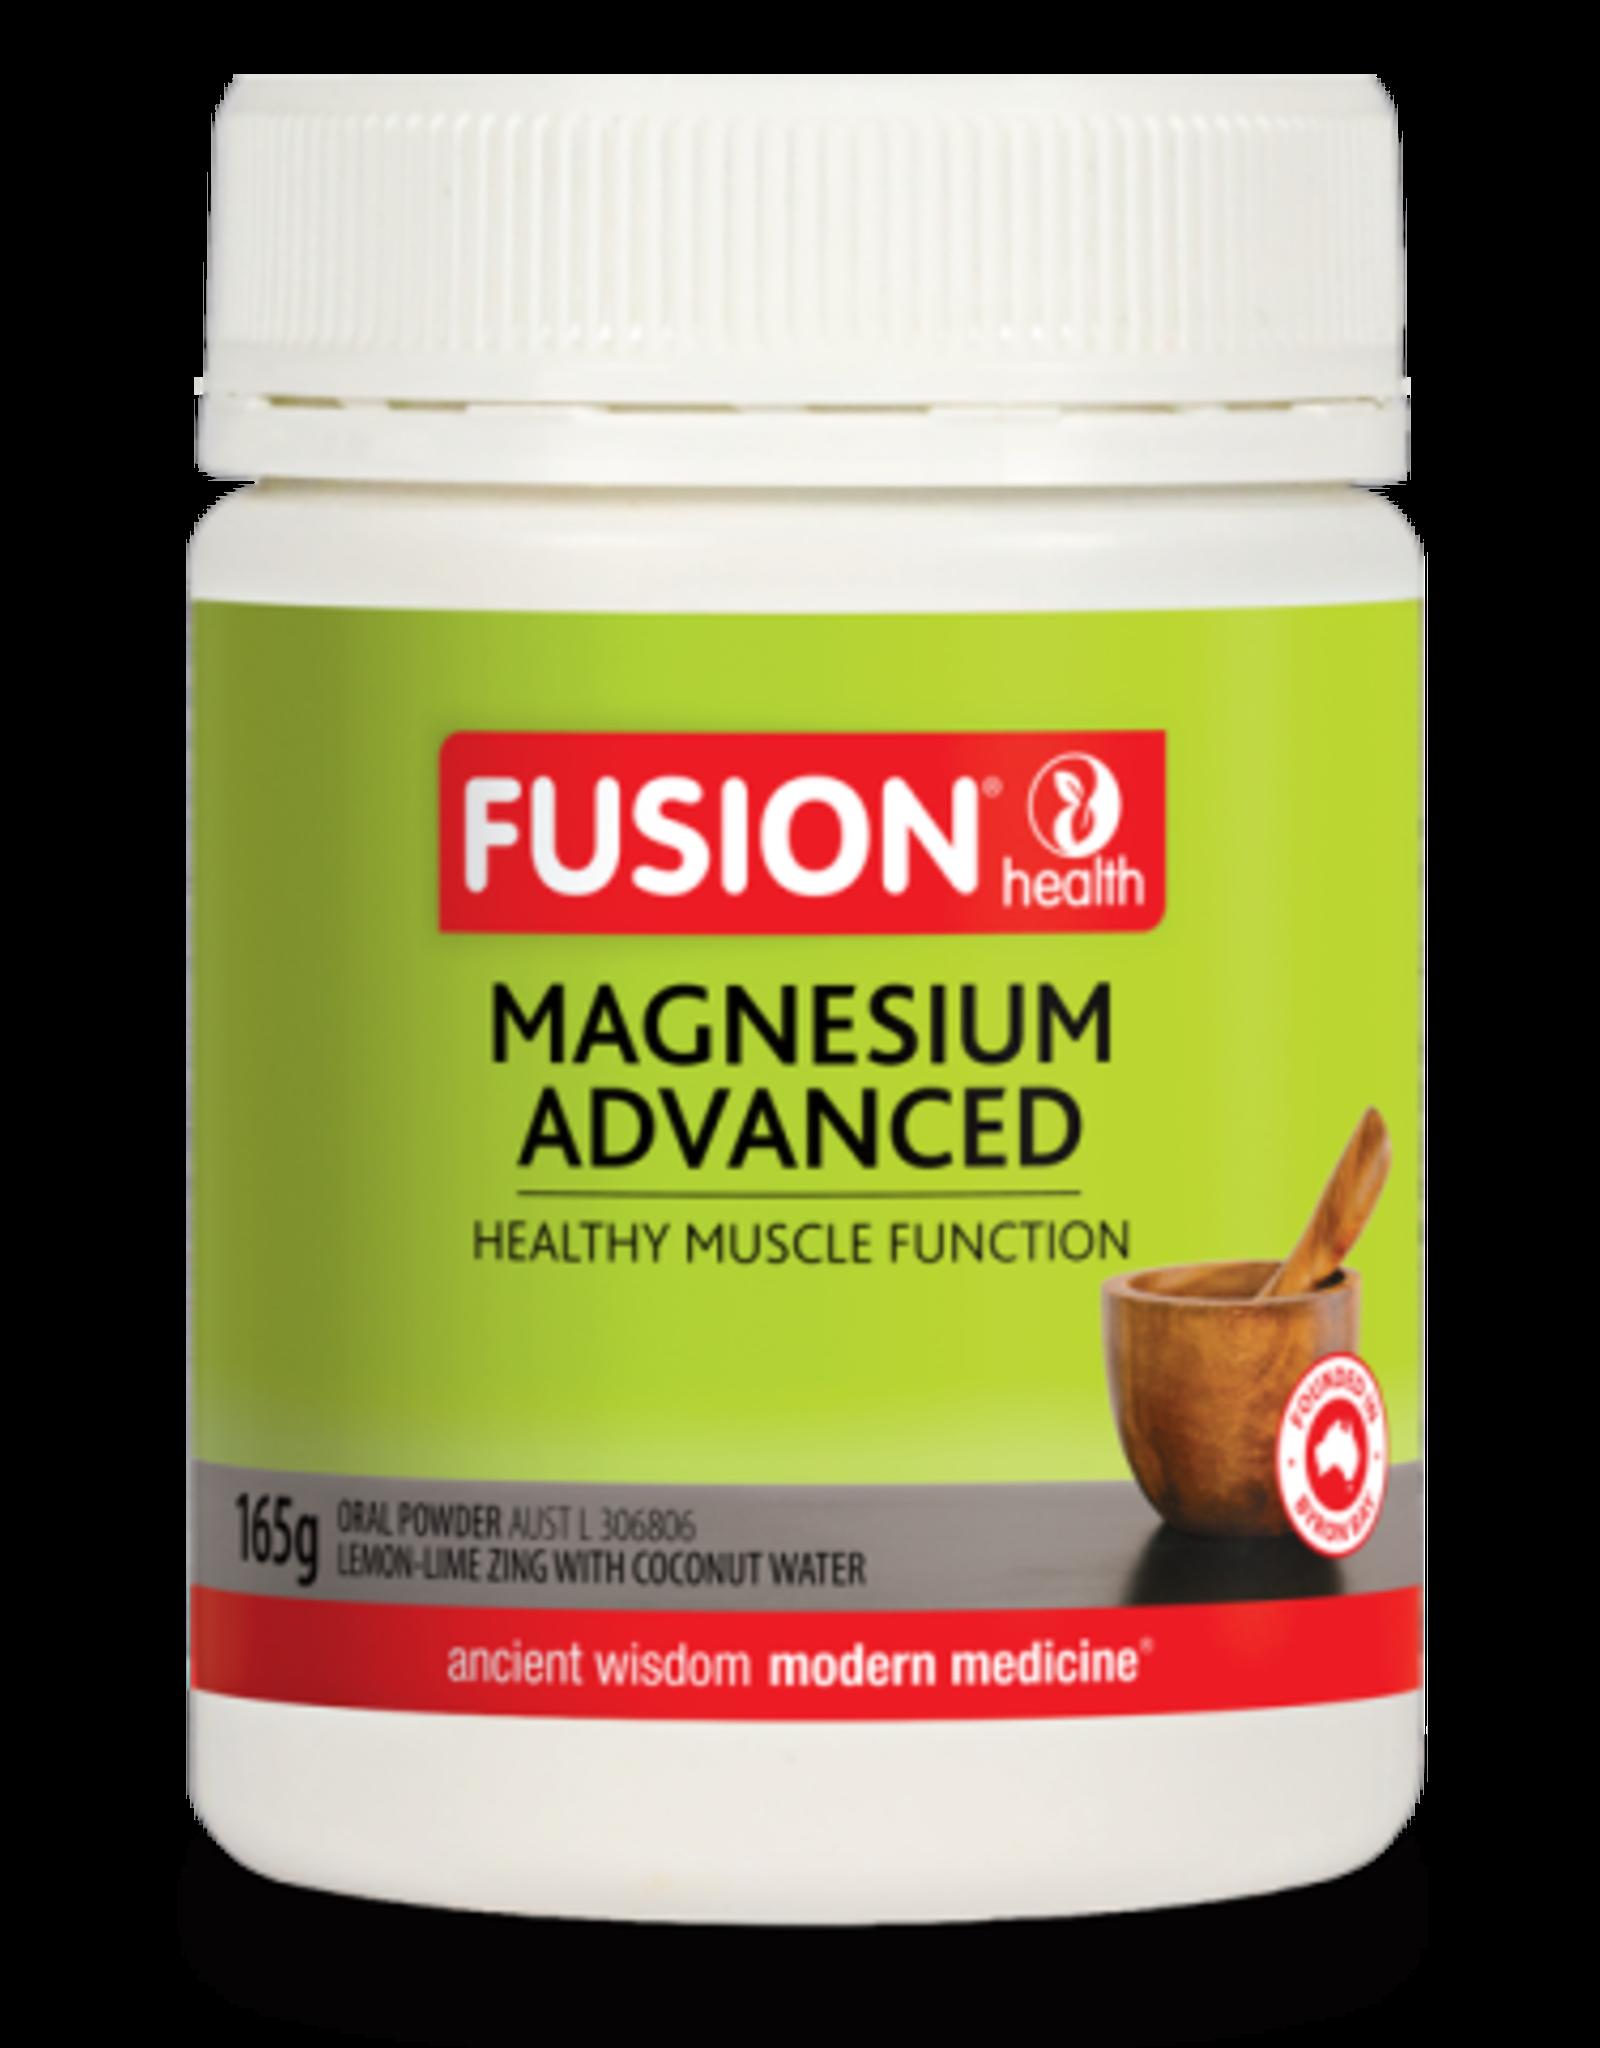 Fusion Magnesium Advanced Powder 165g